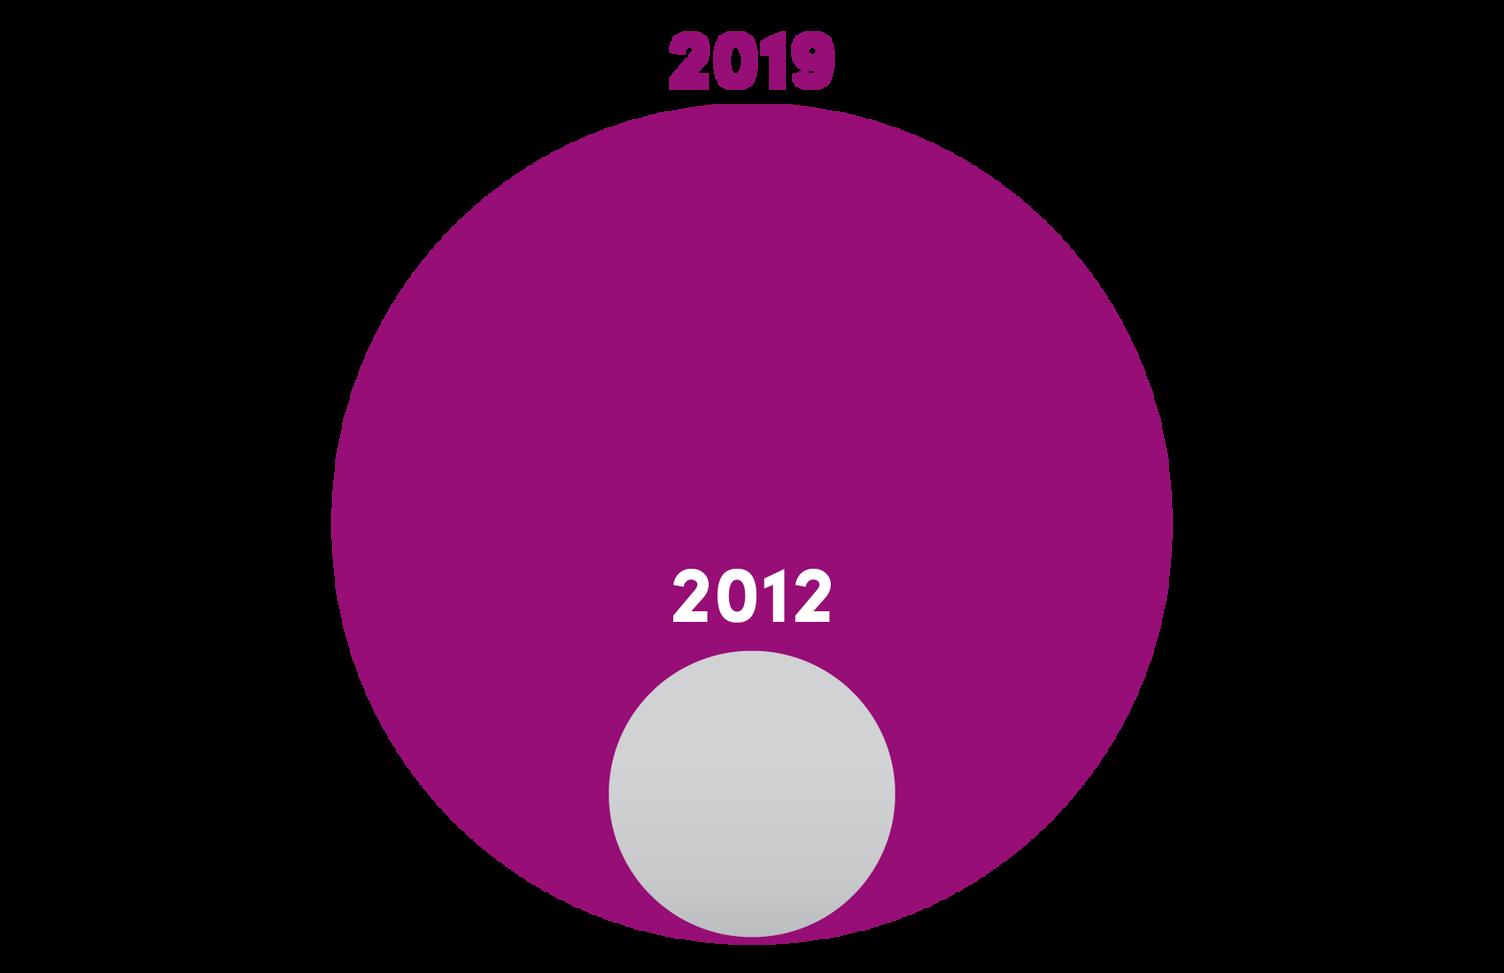 Rosetta leading the industry